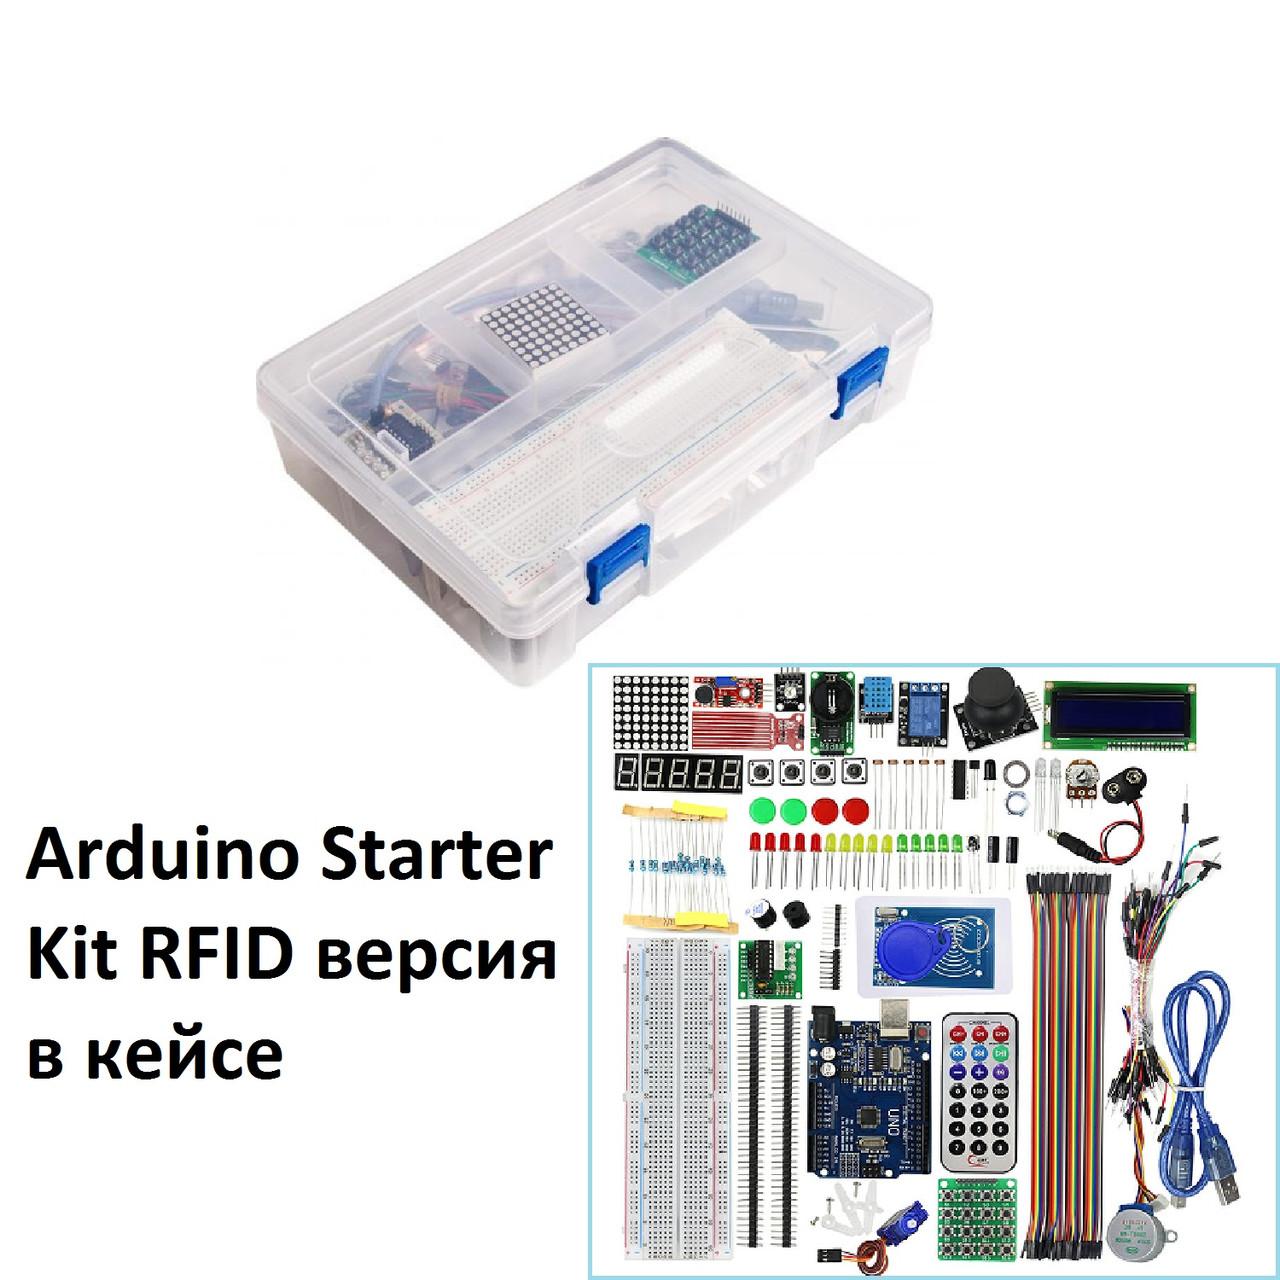 RFID версия Arduino стартовый набор обучающий на базе Uno R3 + кейс